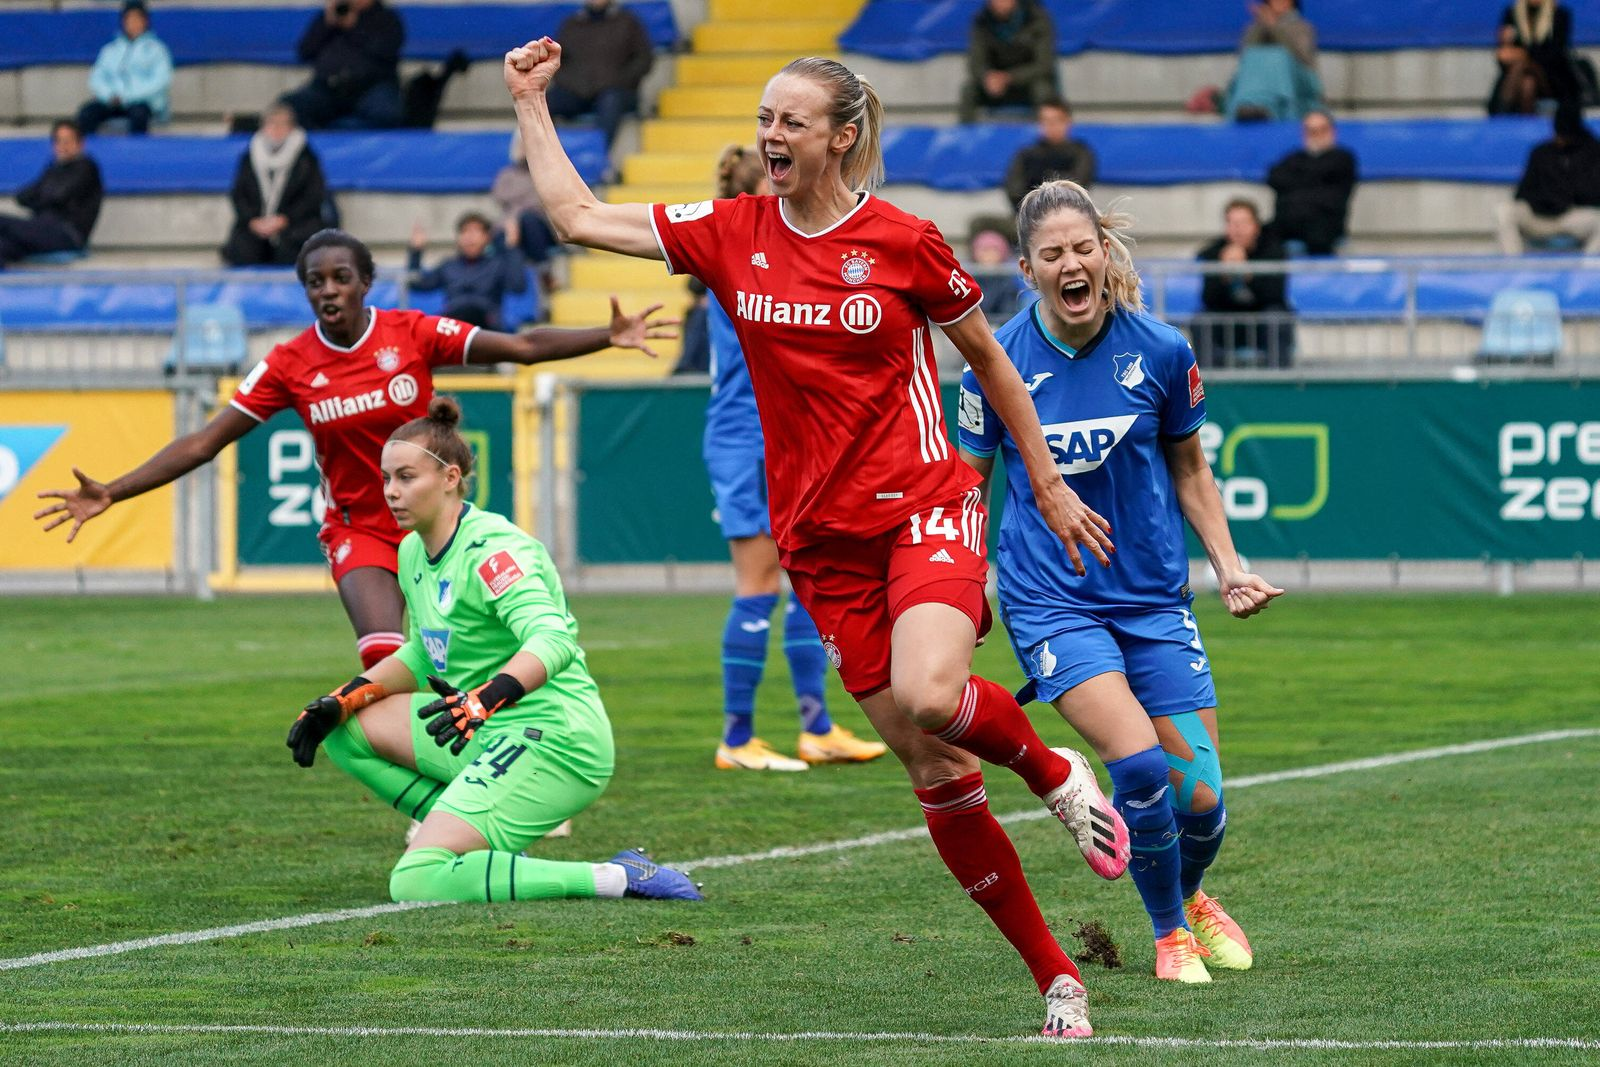 Torschützin Amanda Ilestedt (FCB, 14), jubelt über das Tor zum 0:1, Jubel, Torjubel, Torerfolg, celebrate the goal, goa